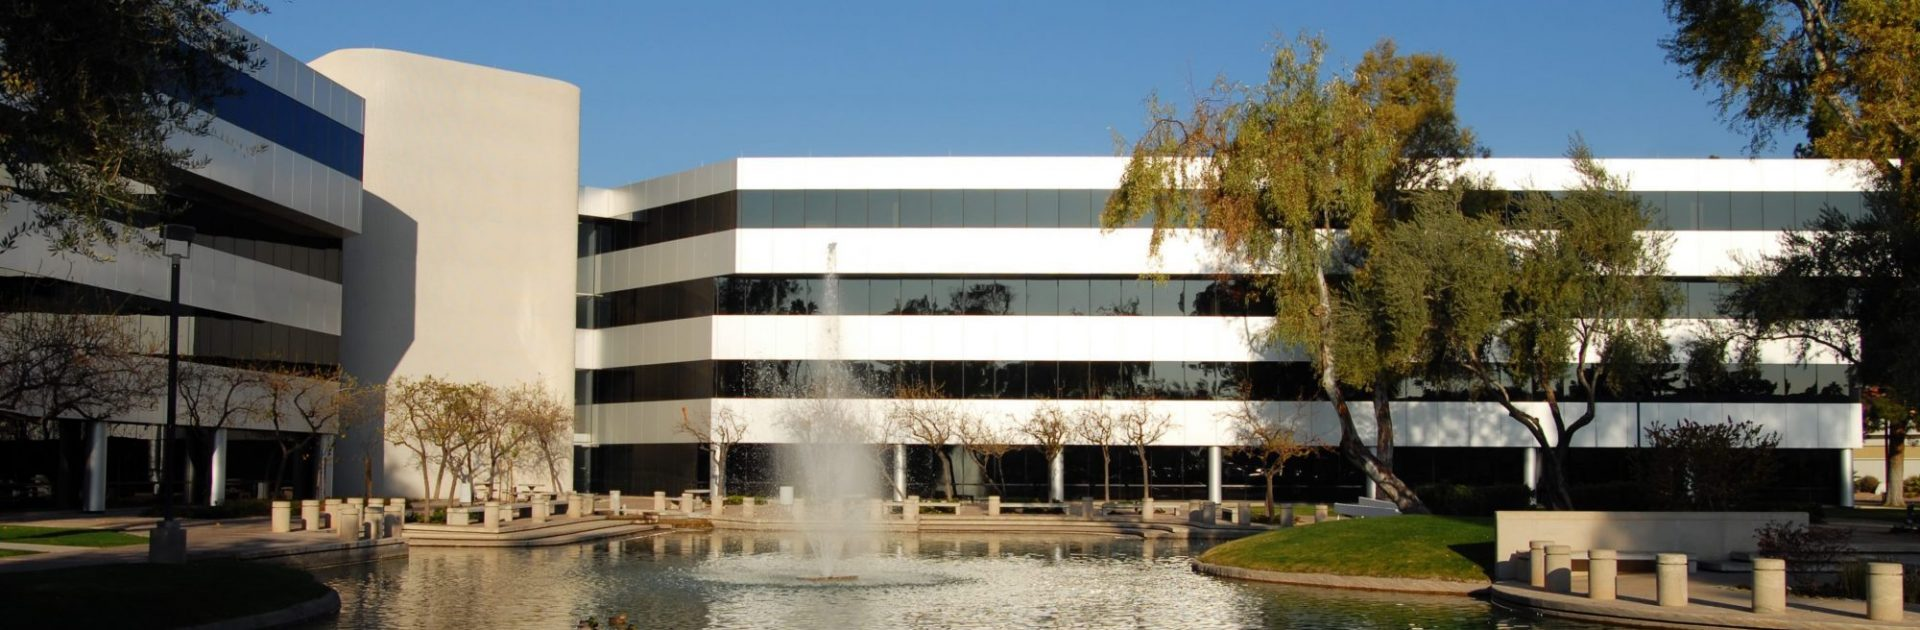 Commercial Painting Services Longmont, CO